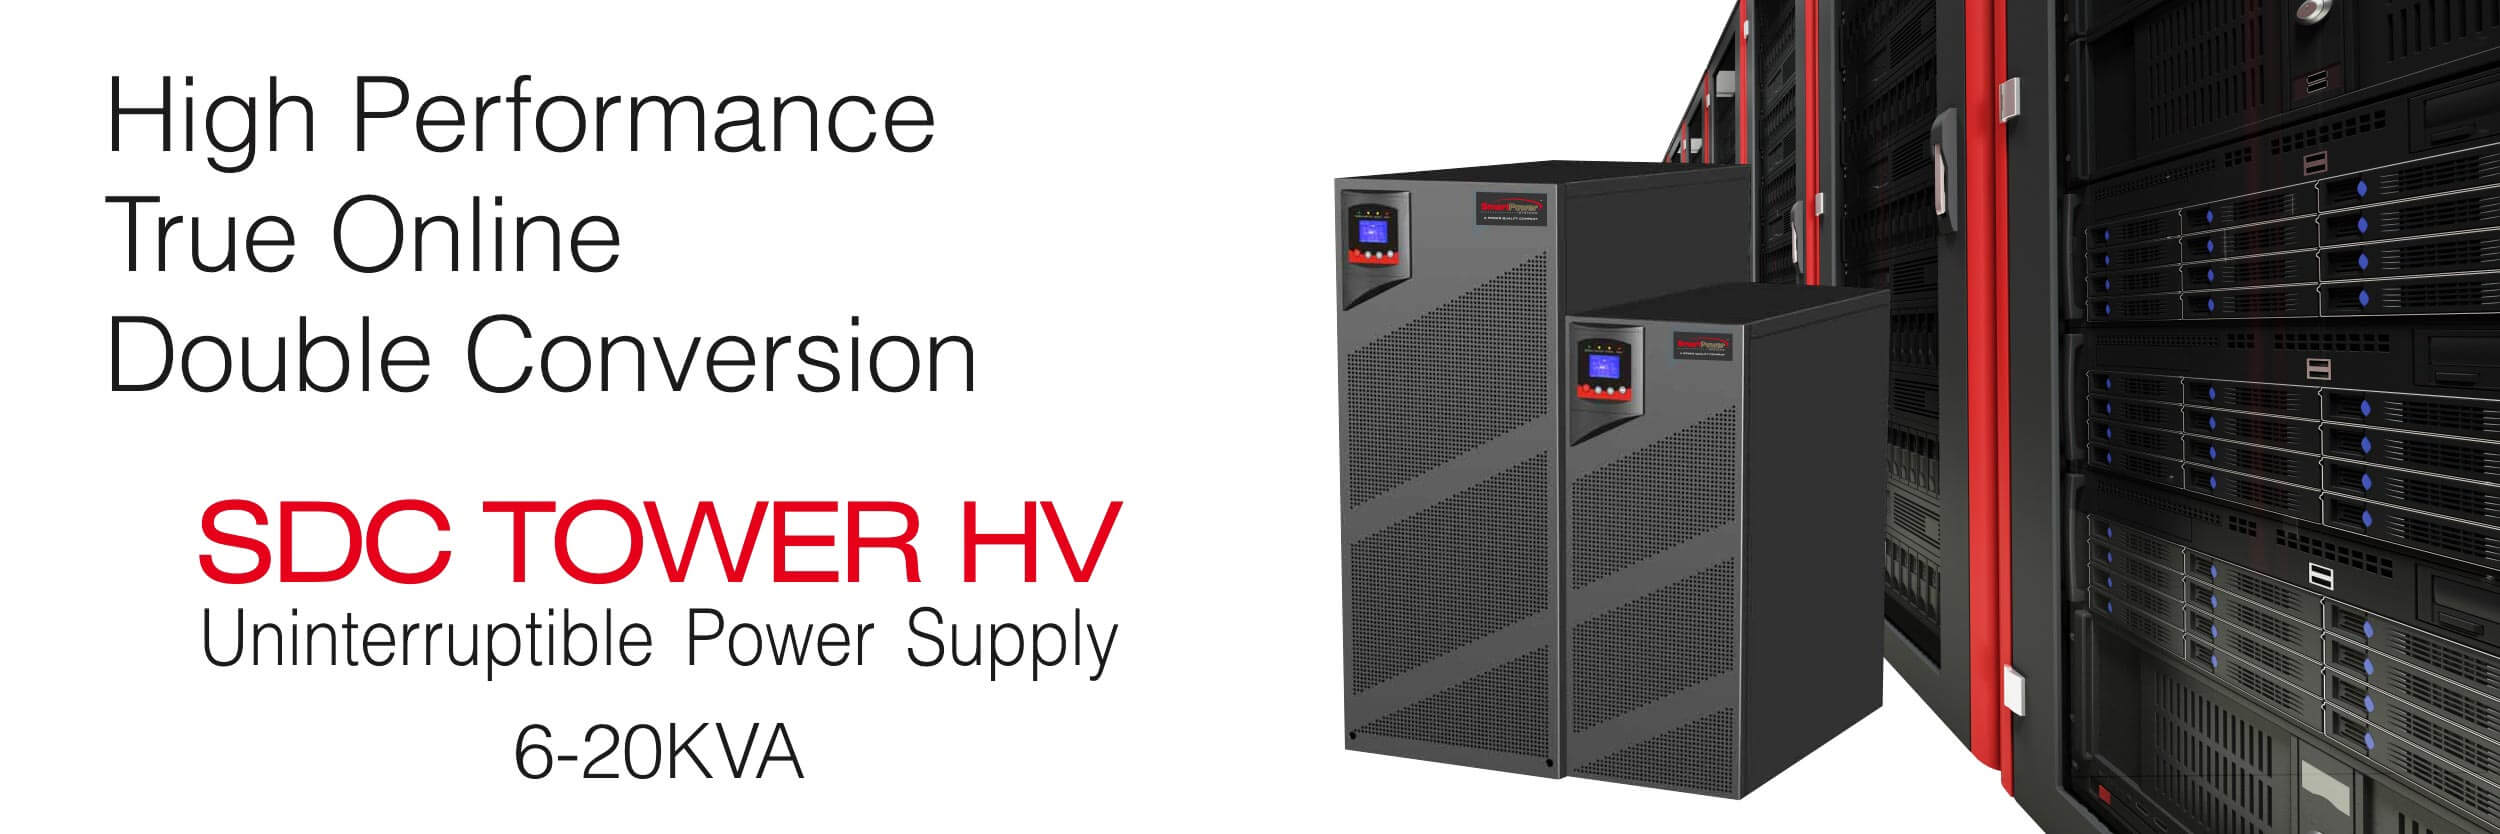 Uninterruptable Power Supply - SDC Tower HV UPS - 6-20KVA | Smart